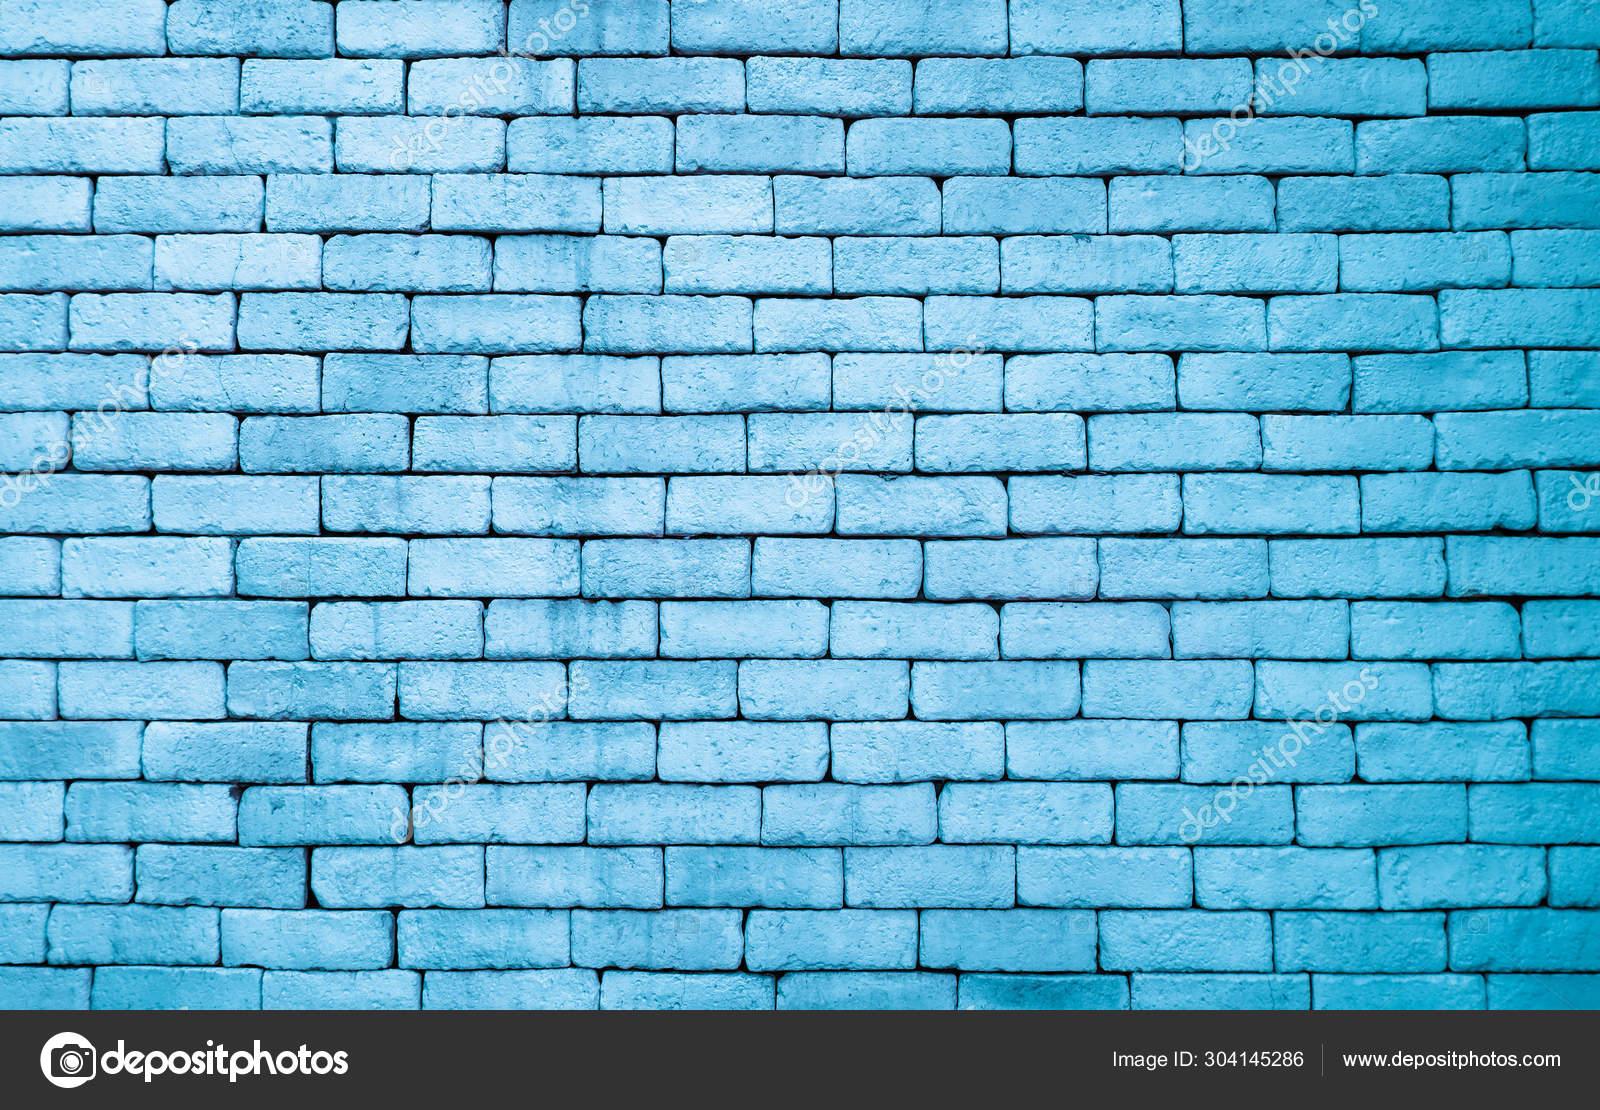 Blue Rough Brick Wall Grunge Texture Pattern Background Rural Room